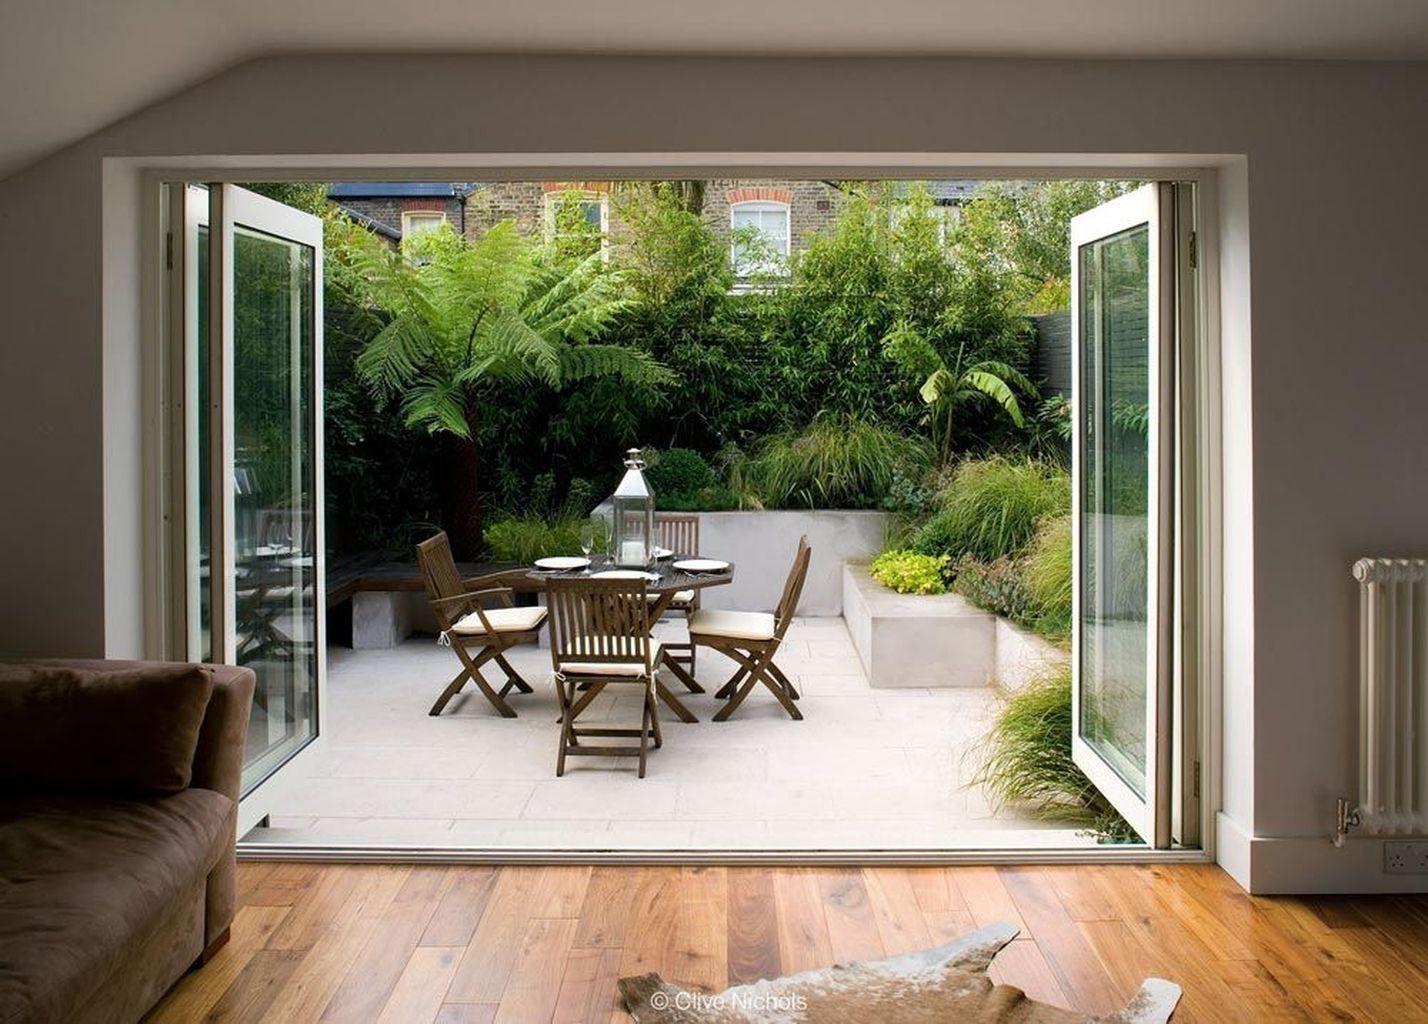 Photo of 95 inspiring little garden ideas in the courtyard – DoMakeover.com